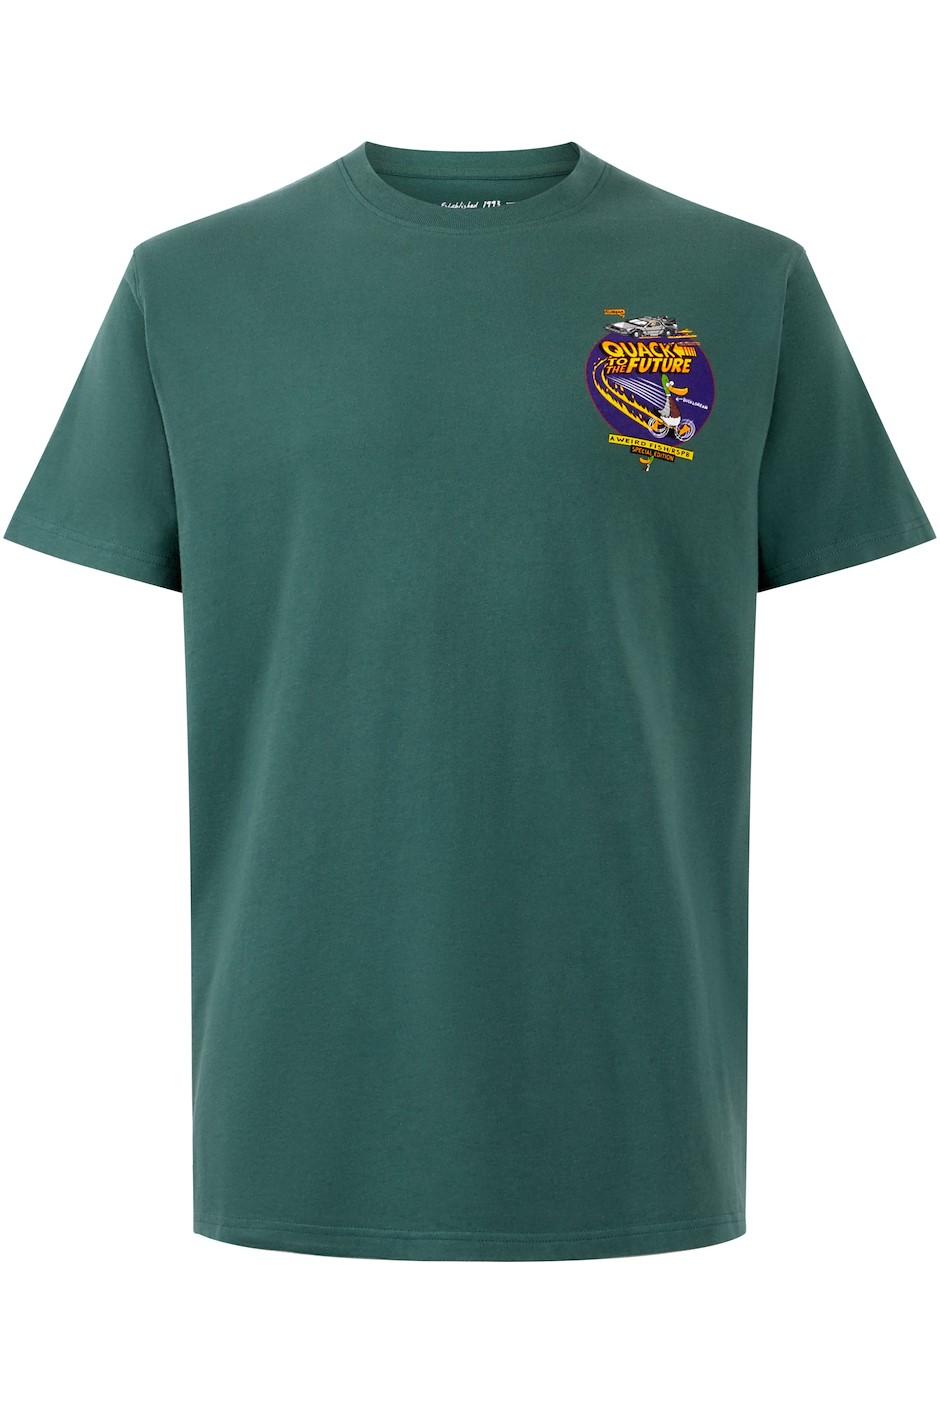 Quack RSPB Artist T-Shirt Dark Green